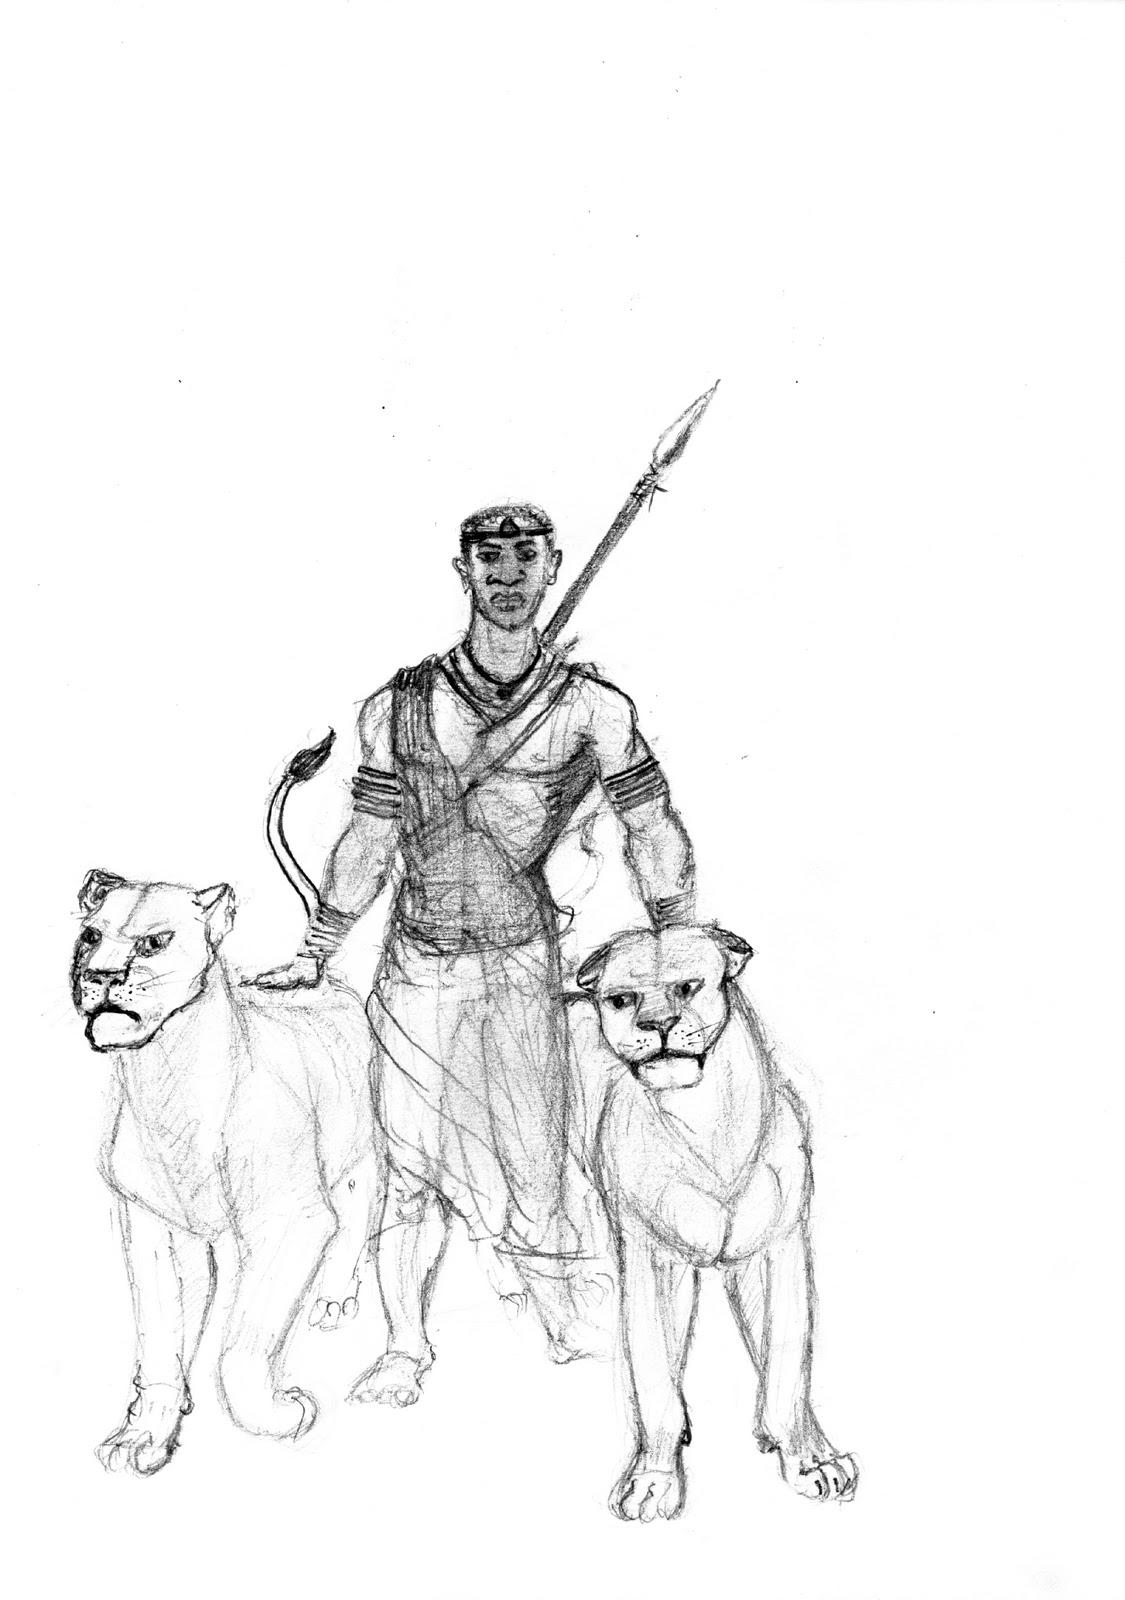 Rajesh Doodles December